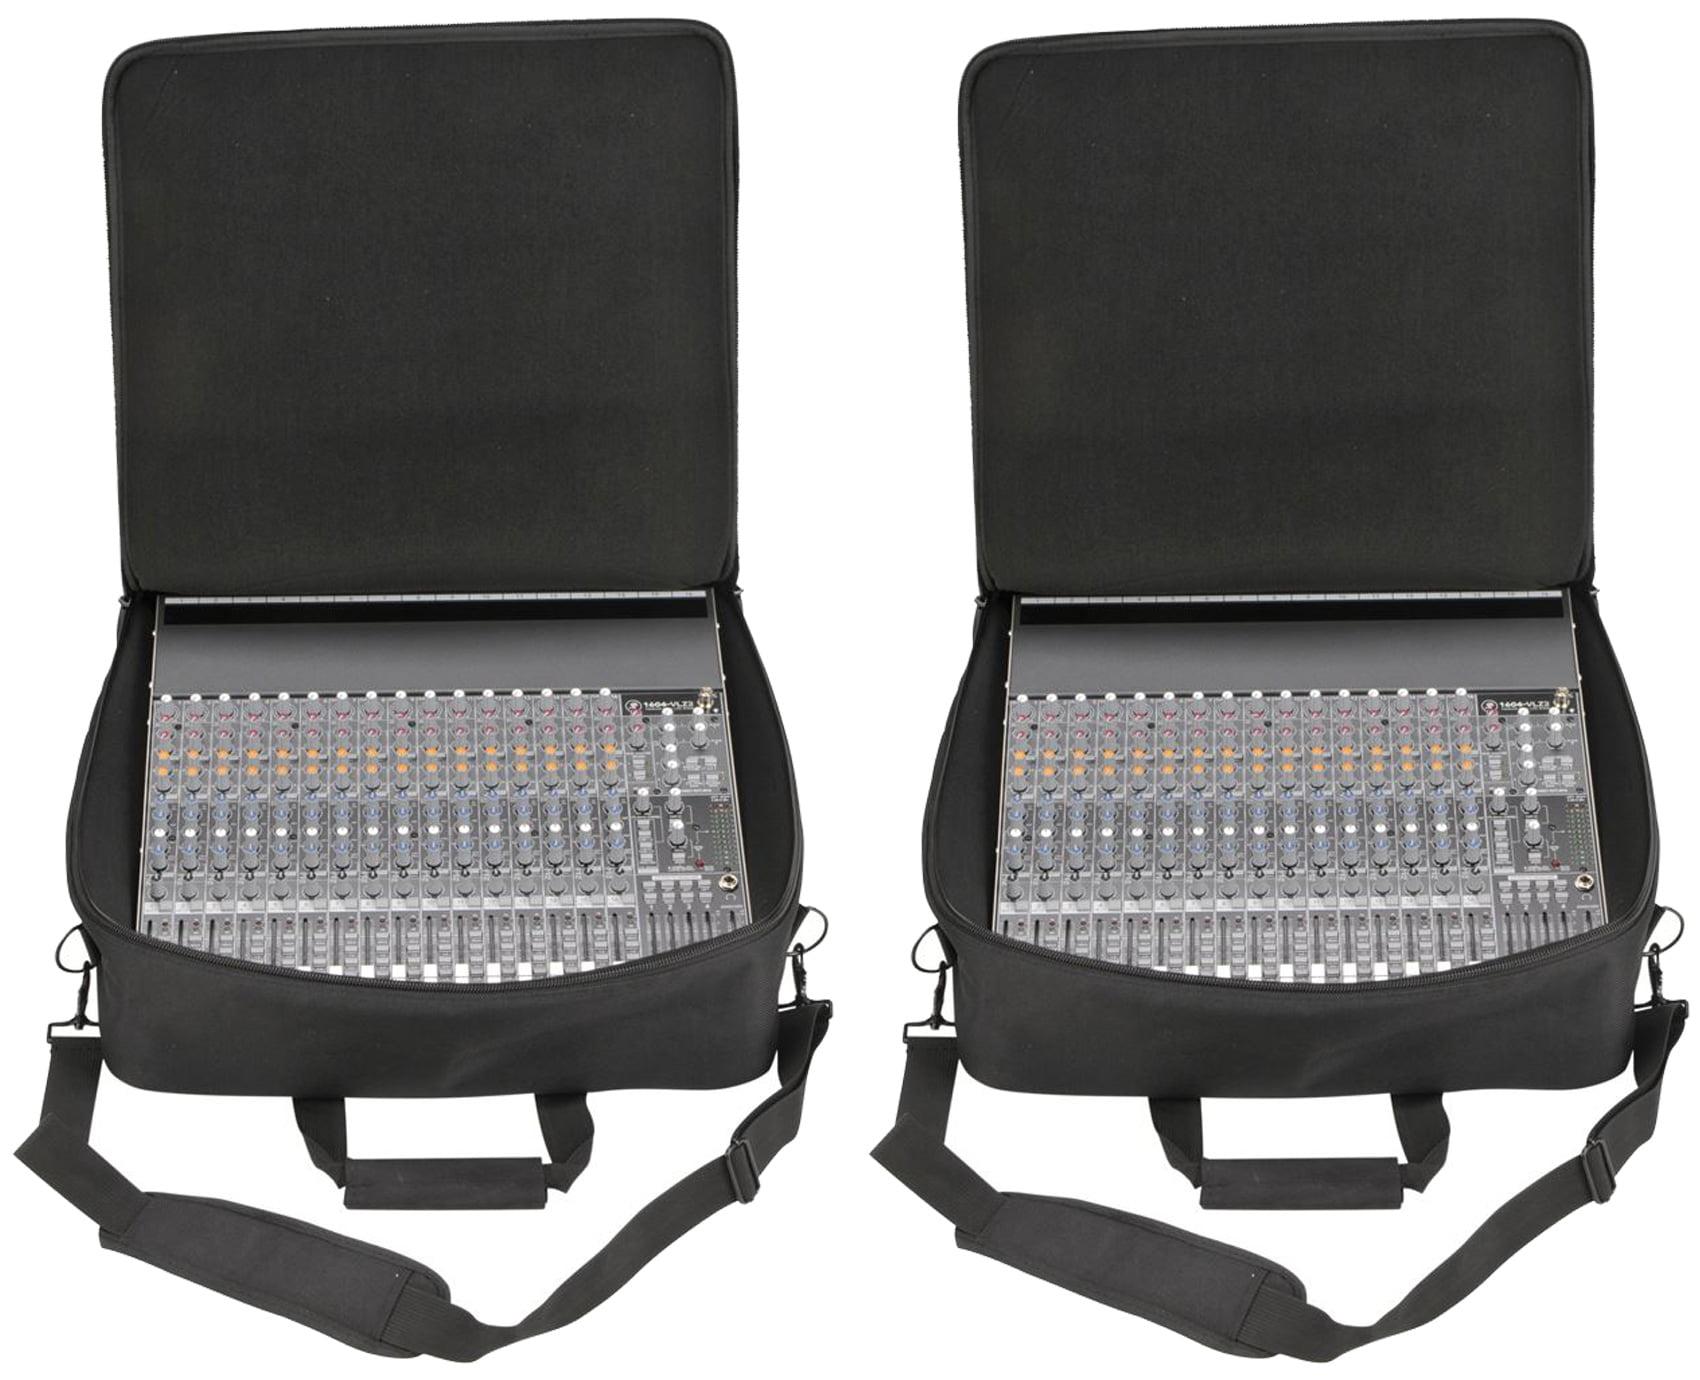 "(2) SKB 1SKB-UB1818 18"" x 18"" x 5.5"" Universal Mixer Equipment Bags by SKB"